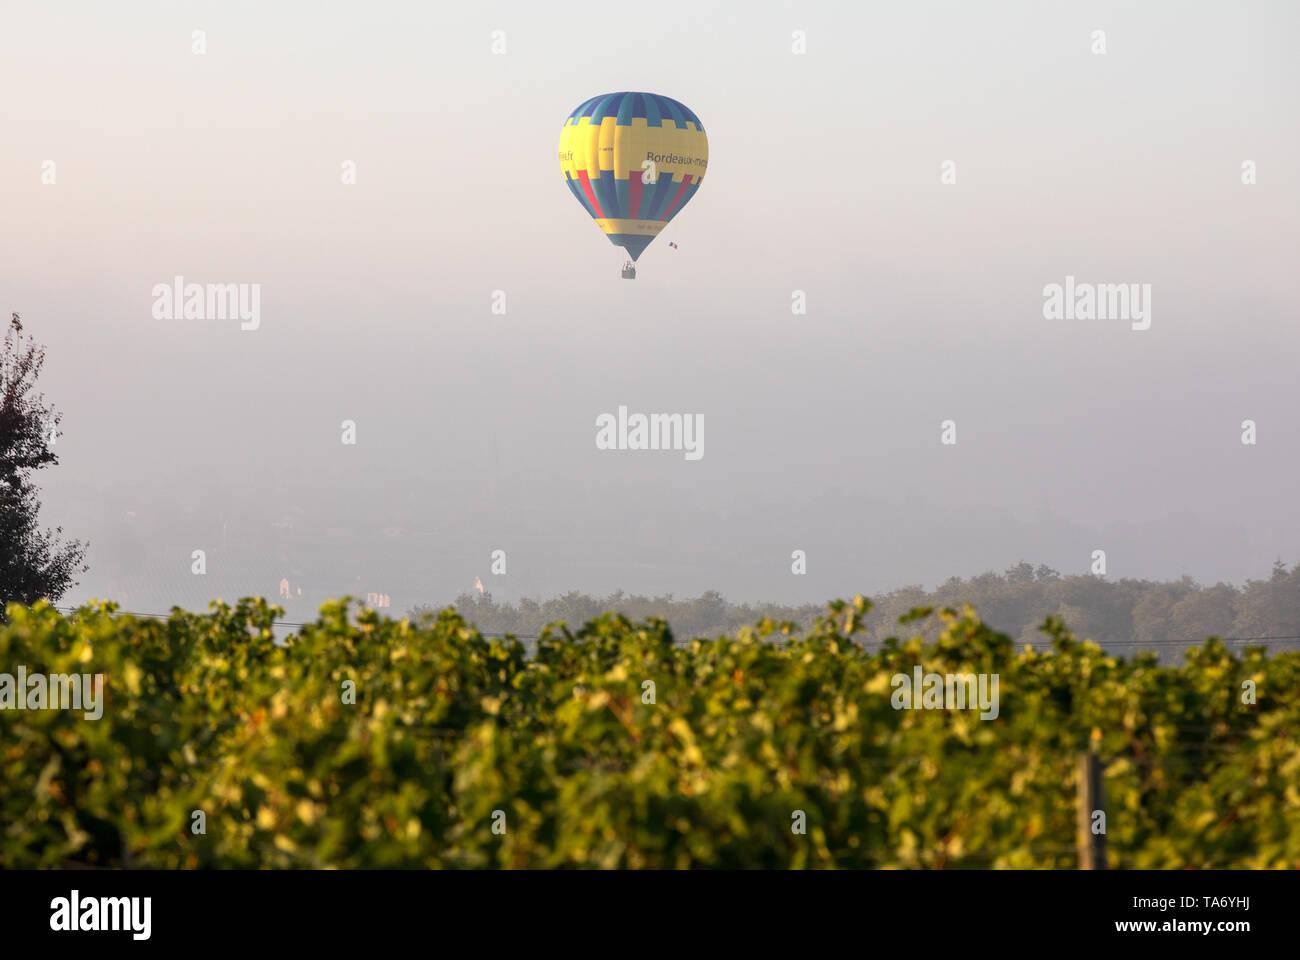 Saint Emilion, France - September 10, 2018: Air balloon flying in the morning over the vineyards near Saint Emilion. Gironde, France - Stock Image